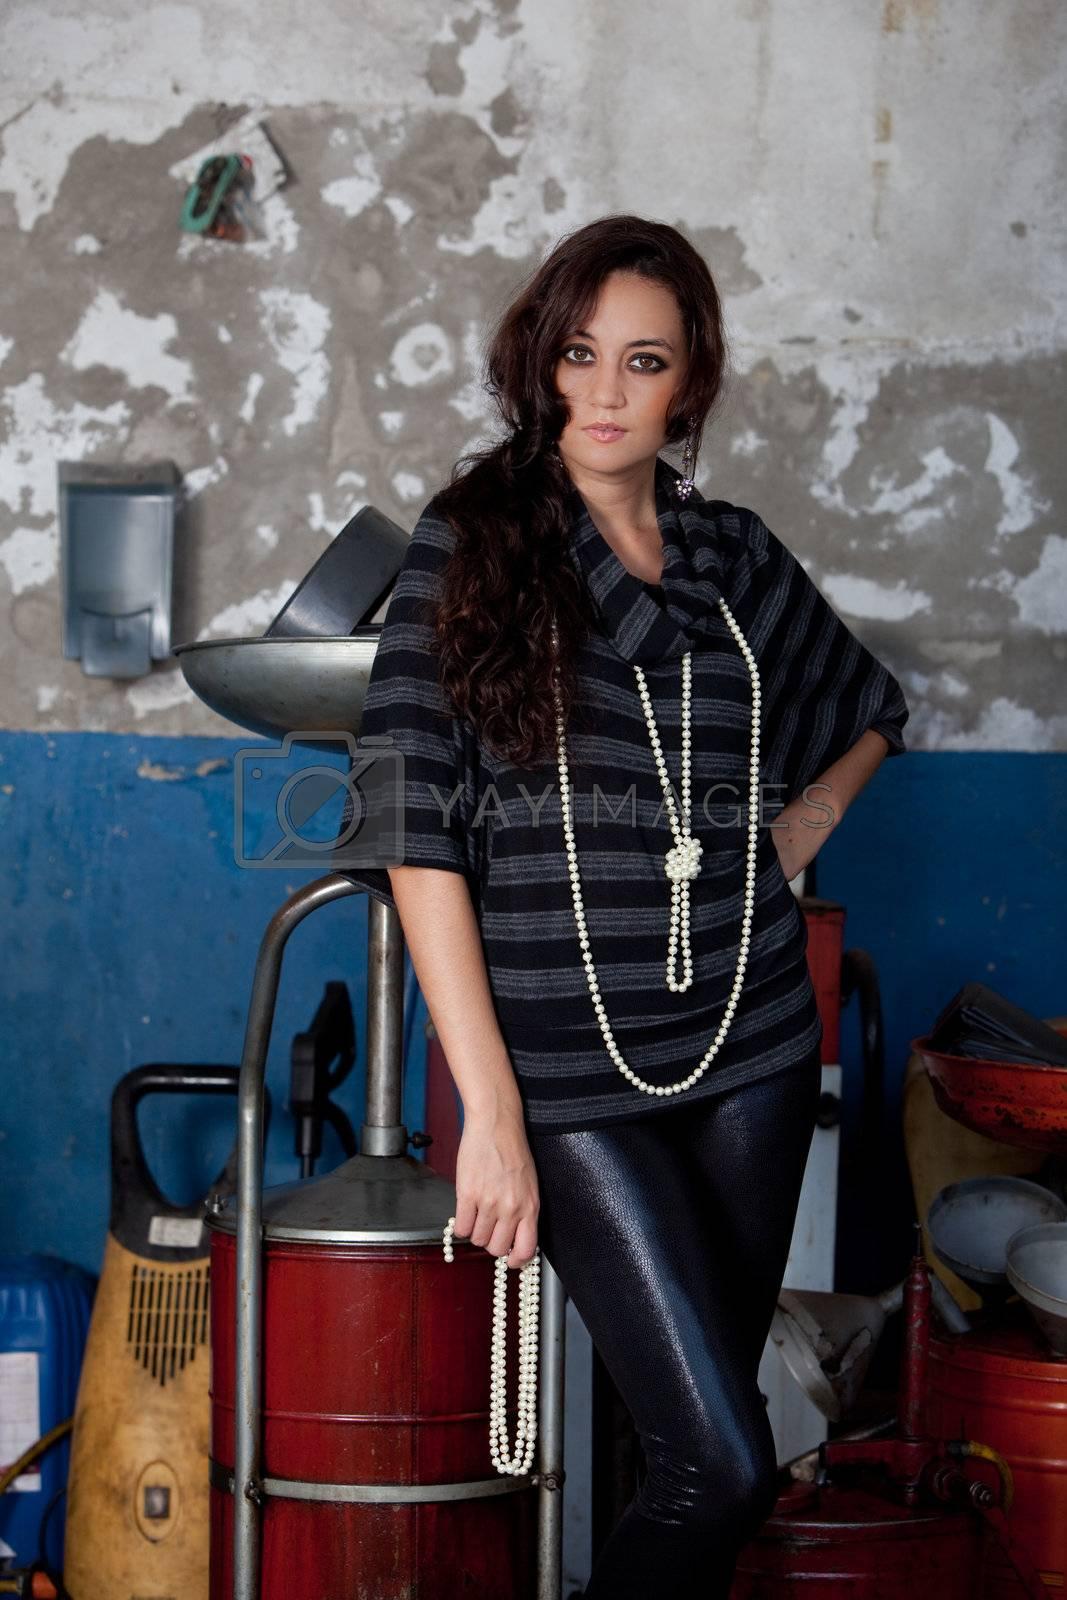 A young brazilian female model shot in a dirty auto repair shop.